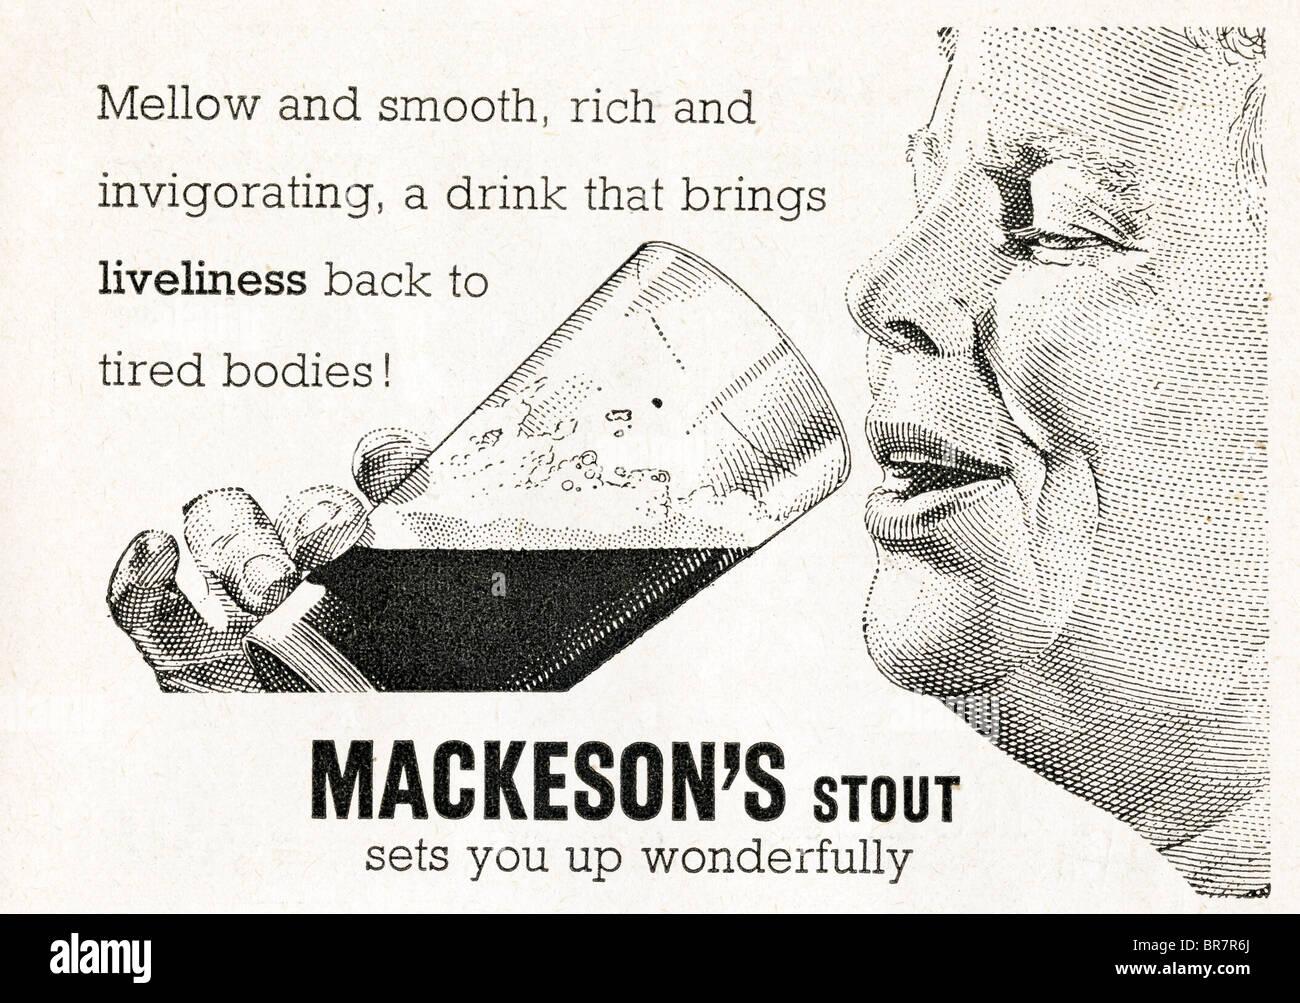 Black and white advert for Mackeson stout inside Lilliput magazine dated November 1947 - Stock Image